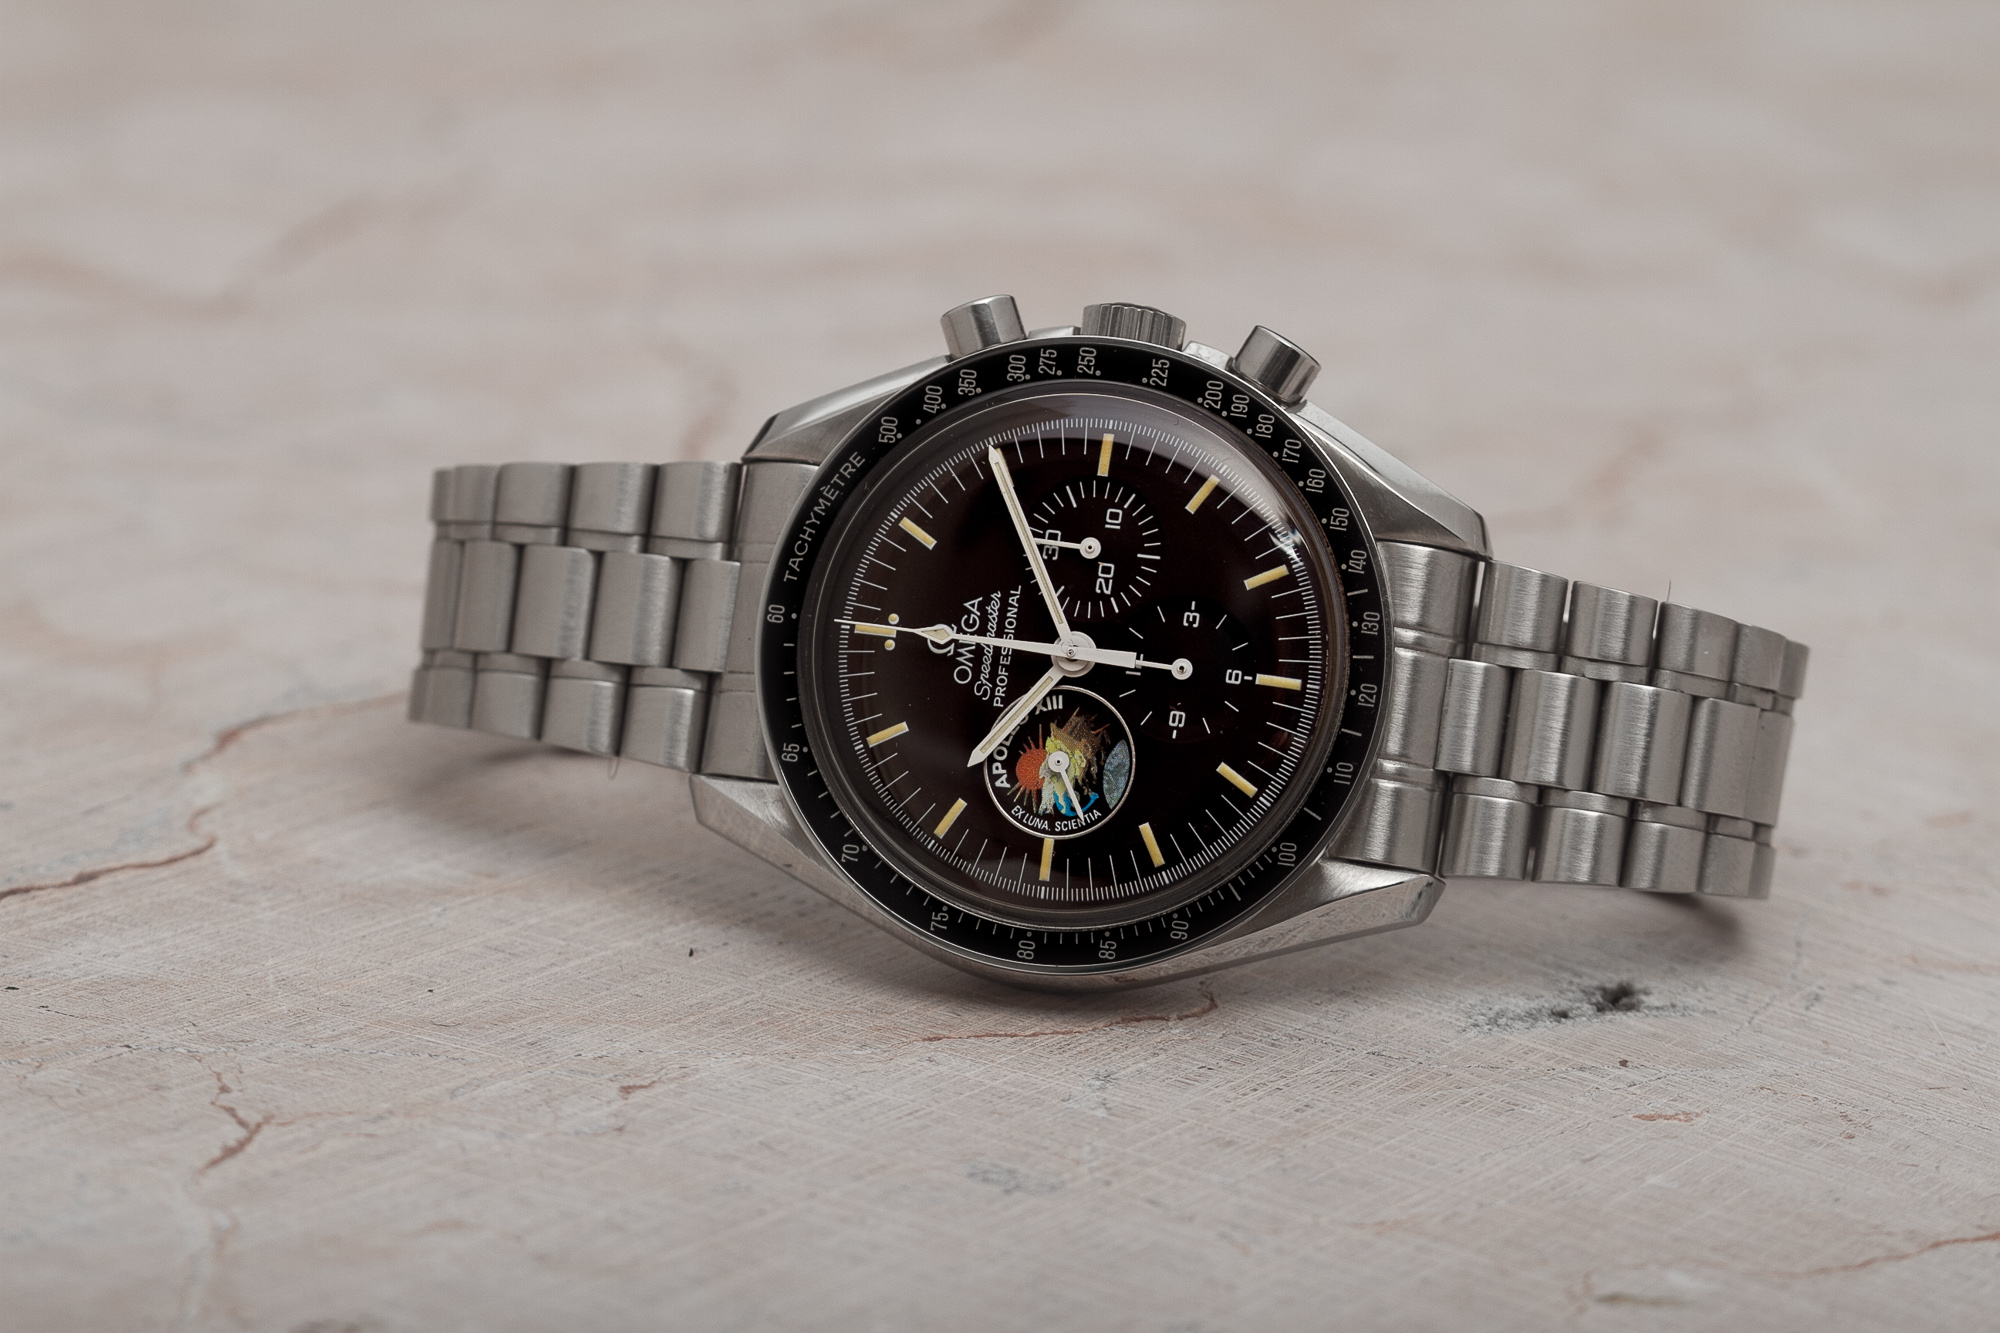 Omega Speedmaster Professional Apollo XIII3595.52.00